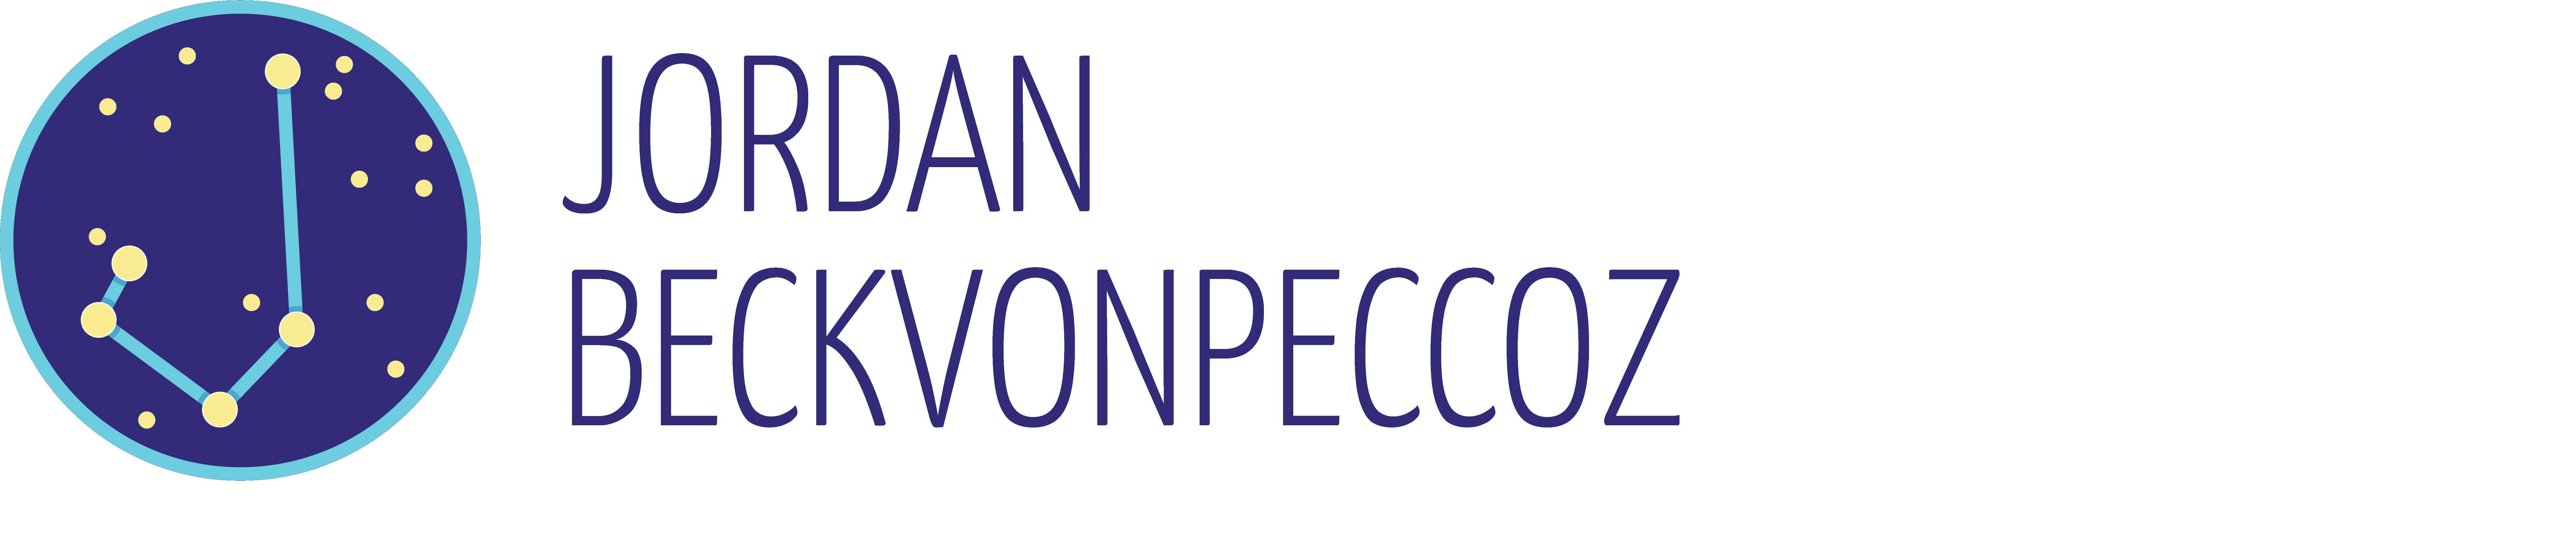 Jordan Beckvonpeccoz